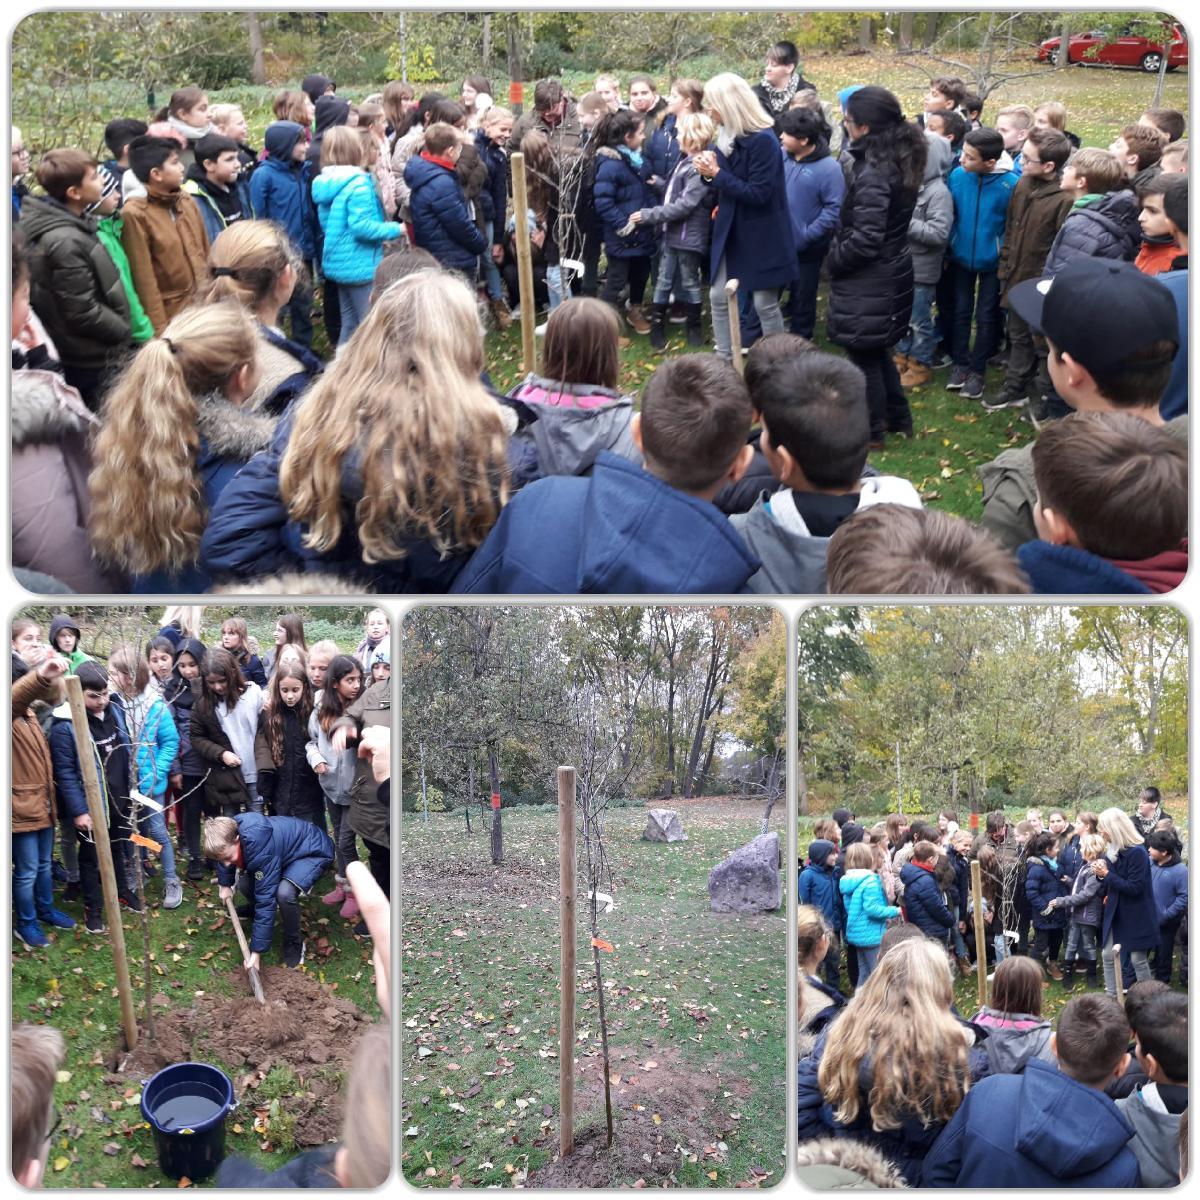 Pflanzung des Zuccalmaglio Baumes 2018